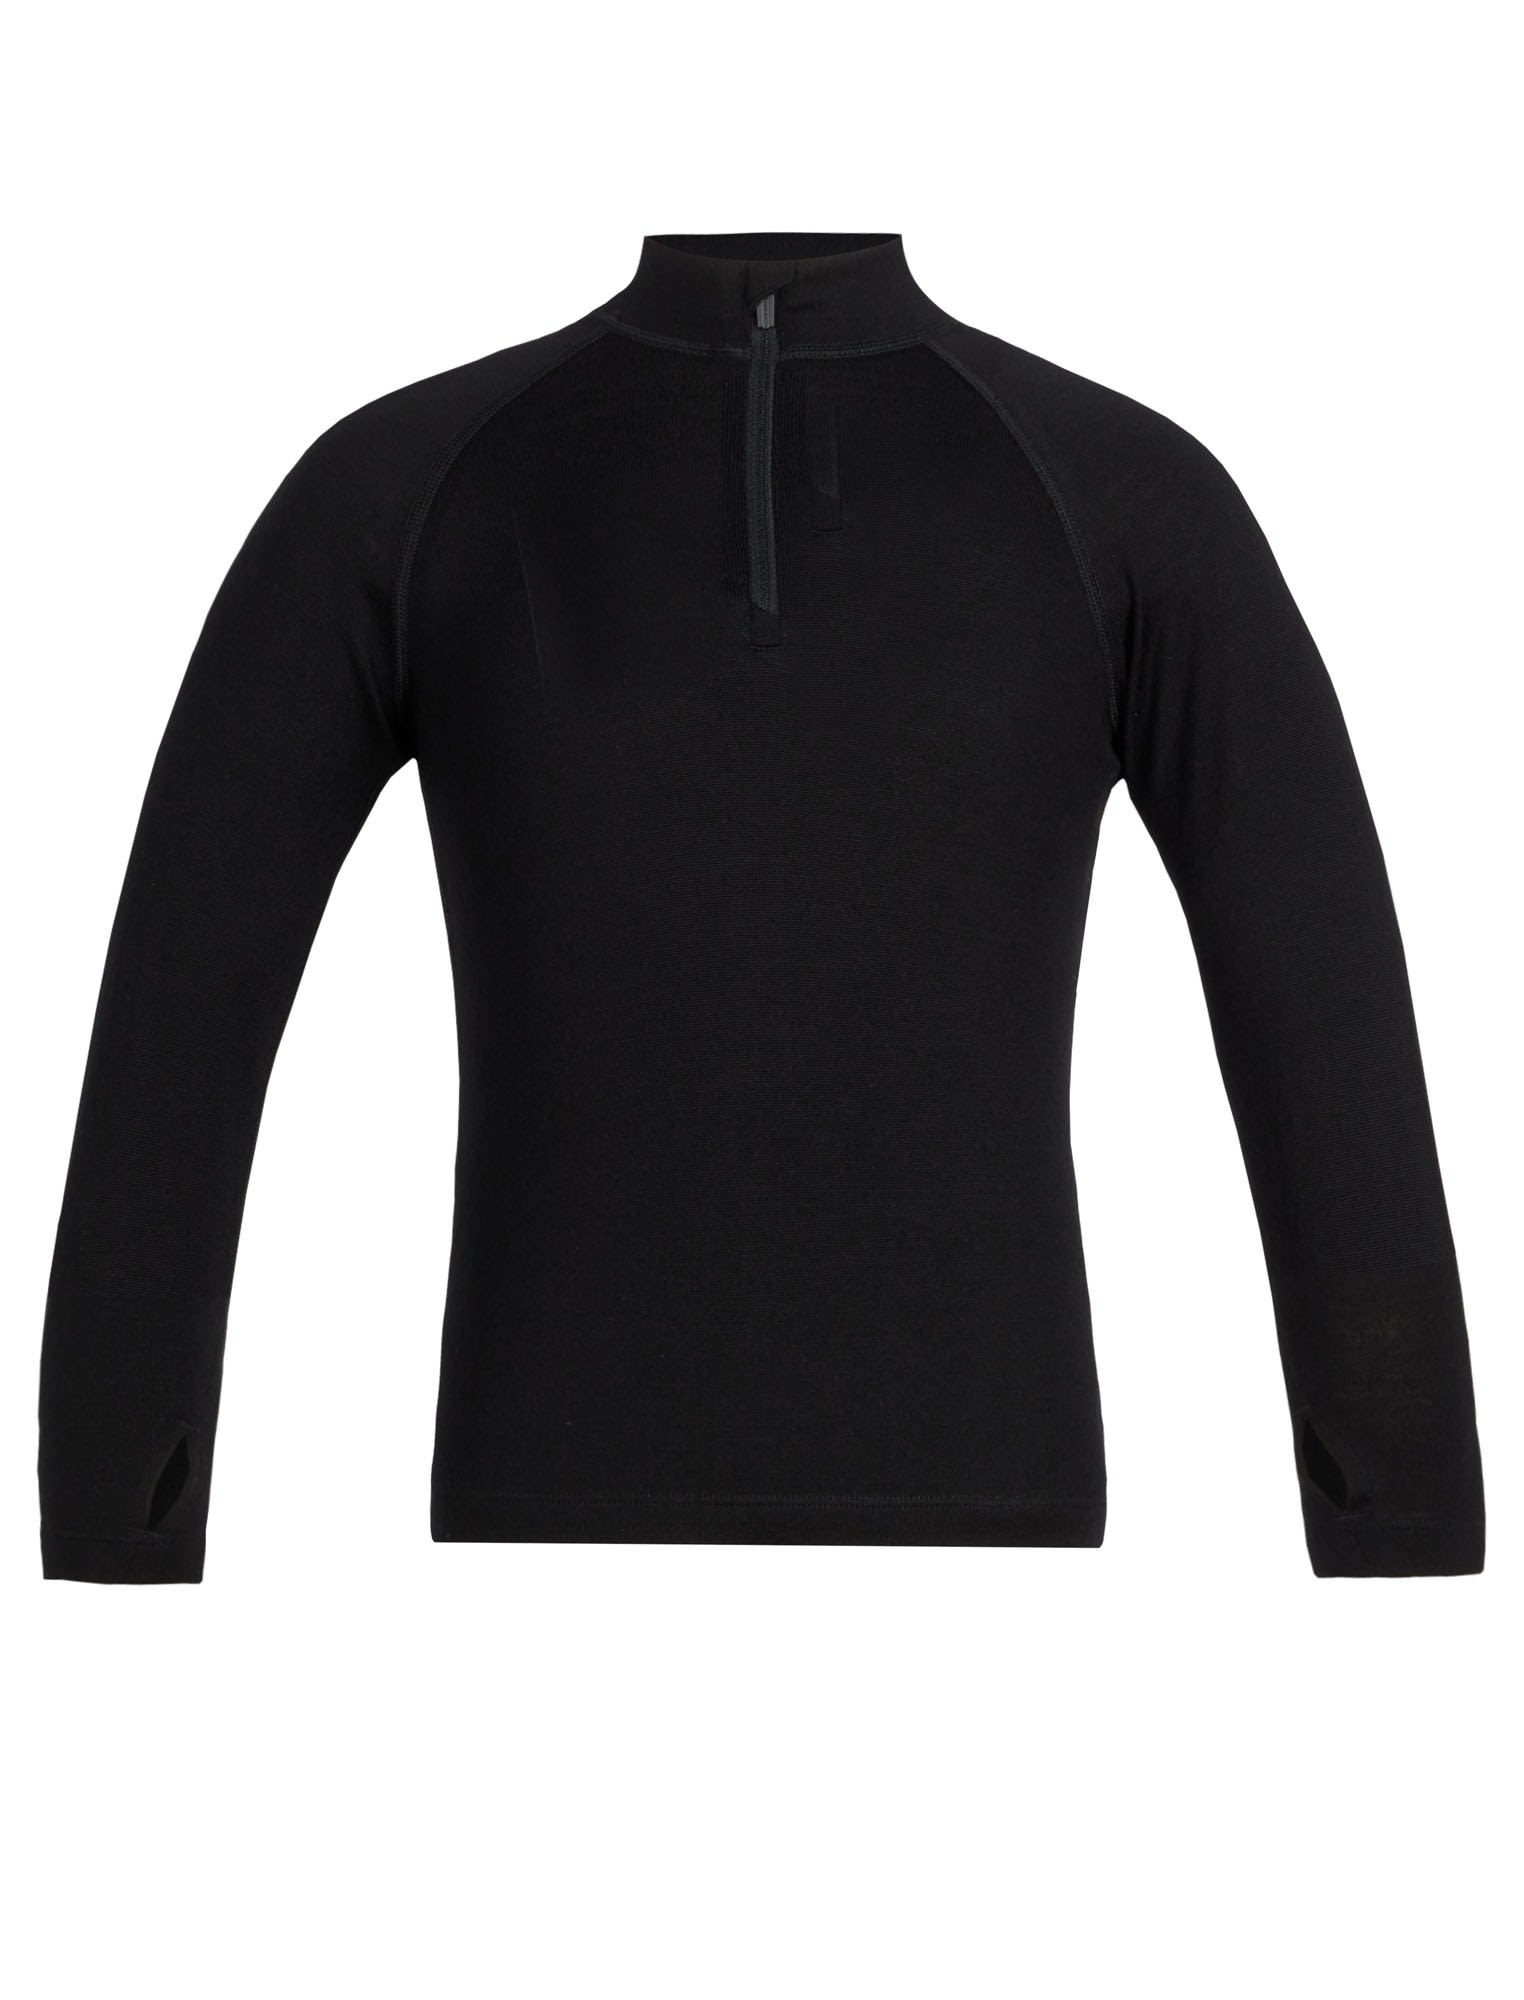 Icebreaker Kids 260 Tech Long-Sleeve Half Zip Schwarz, Merino 02 -Farbe Black, 0